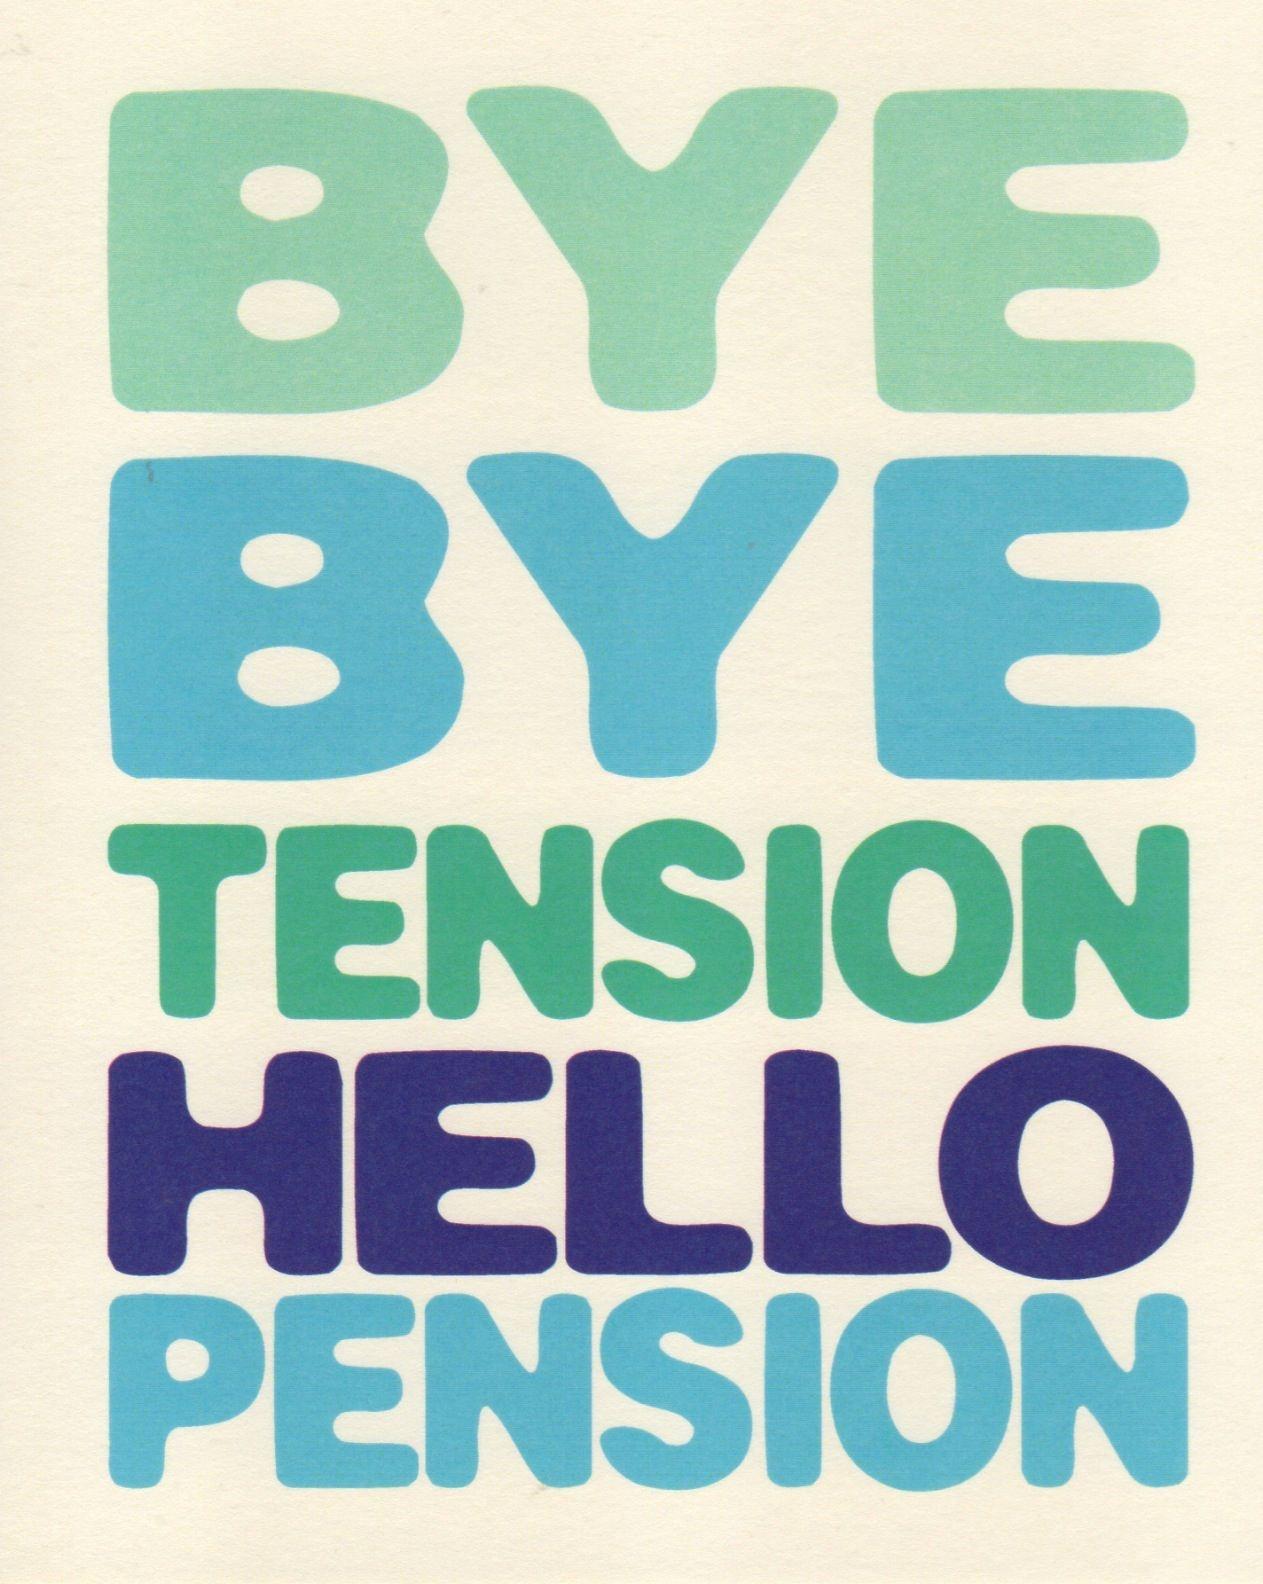 12 Beautiful Printable Retirement Cards | Kittybabylove - Free Printable Retirement Cards